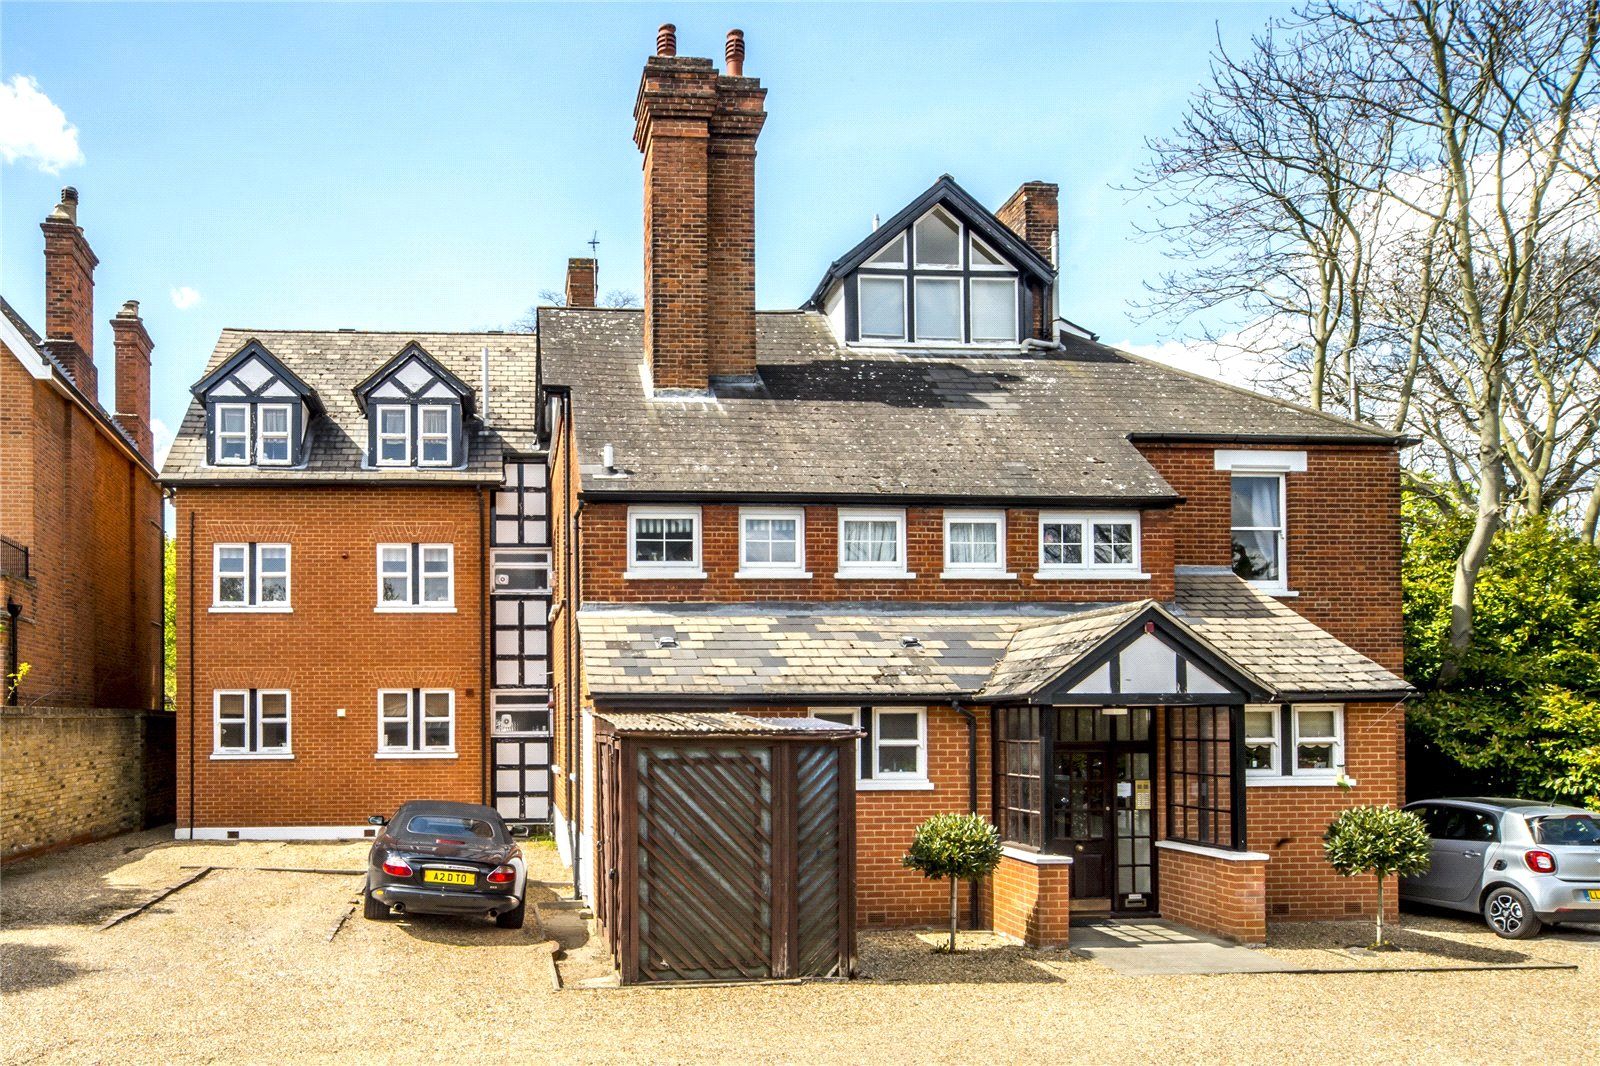 Creefleet House, Kew Road, TW9 3EE - Antony Roberts